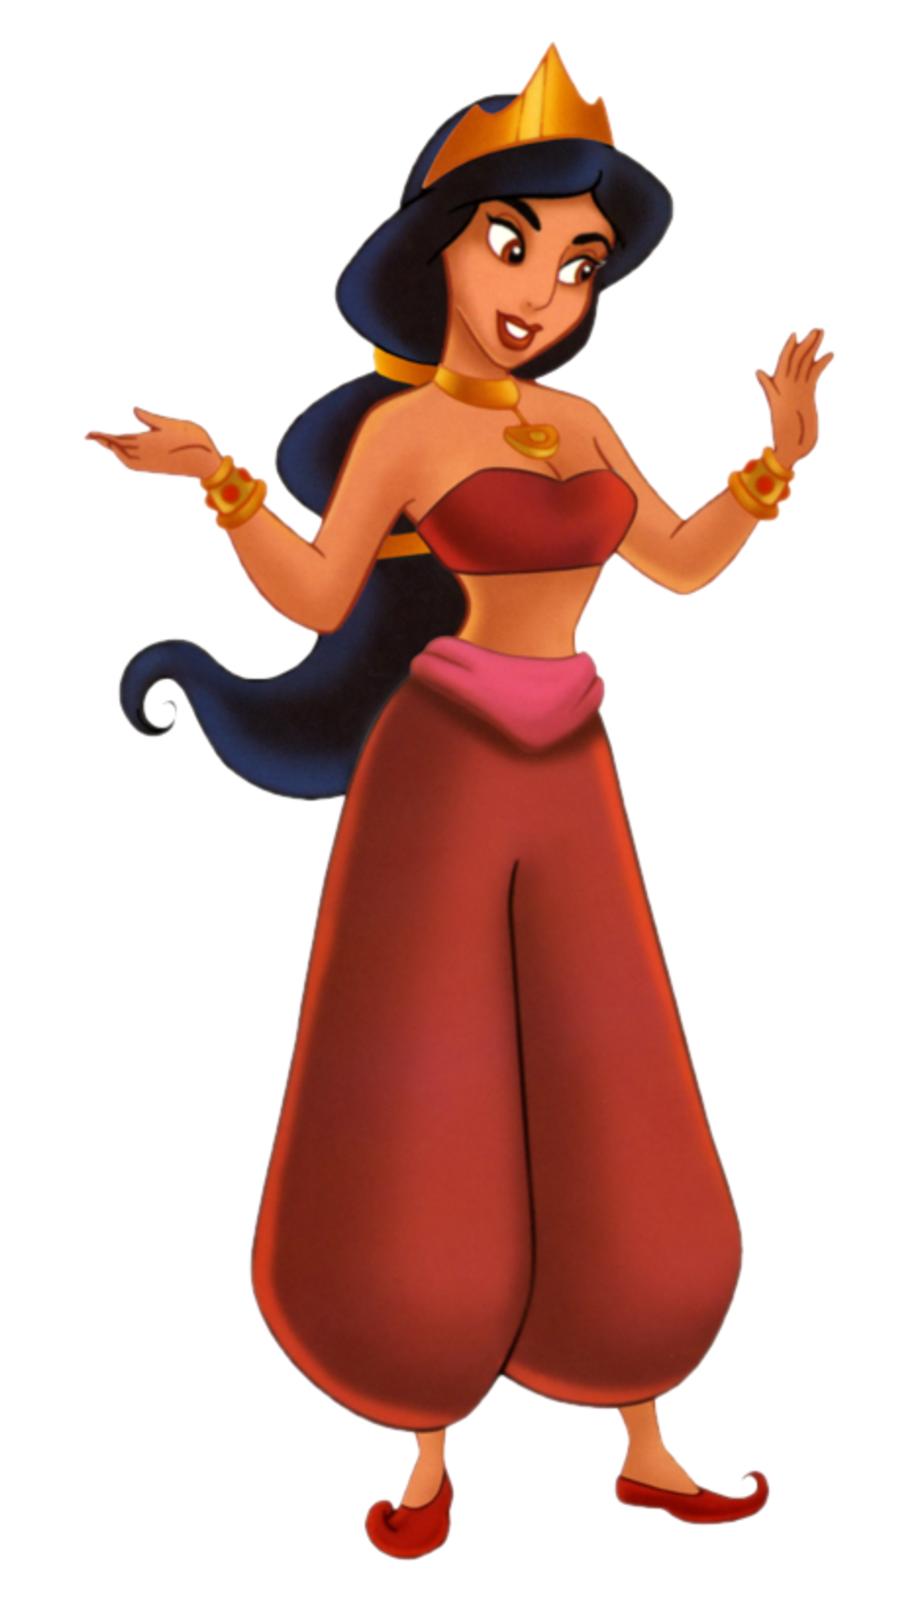 Princess Jasmine Red Dress Transparent Png Download 5422263